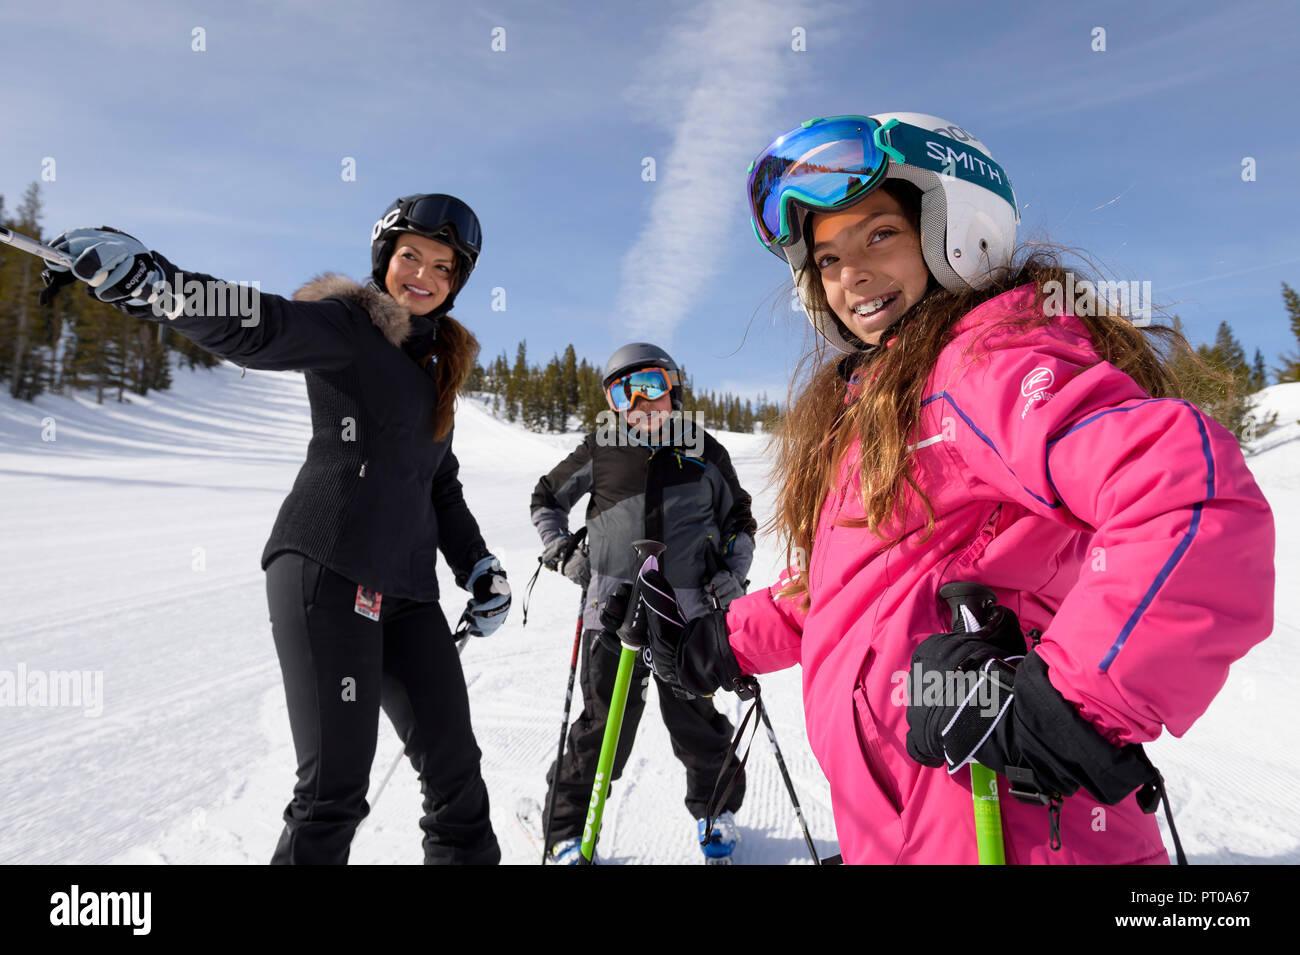 Ski instructor with kids during fun family ski lessons at Mt. Rose Ski Tahoe, the closest Lake Tahoe ski resort to Reno, Nevada, USA. Stock Photo